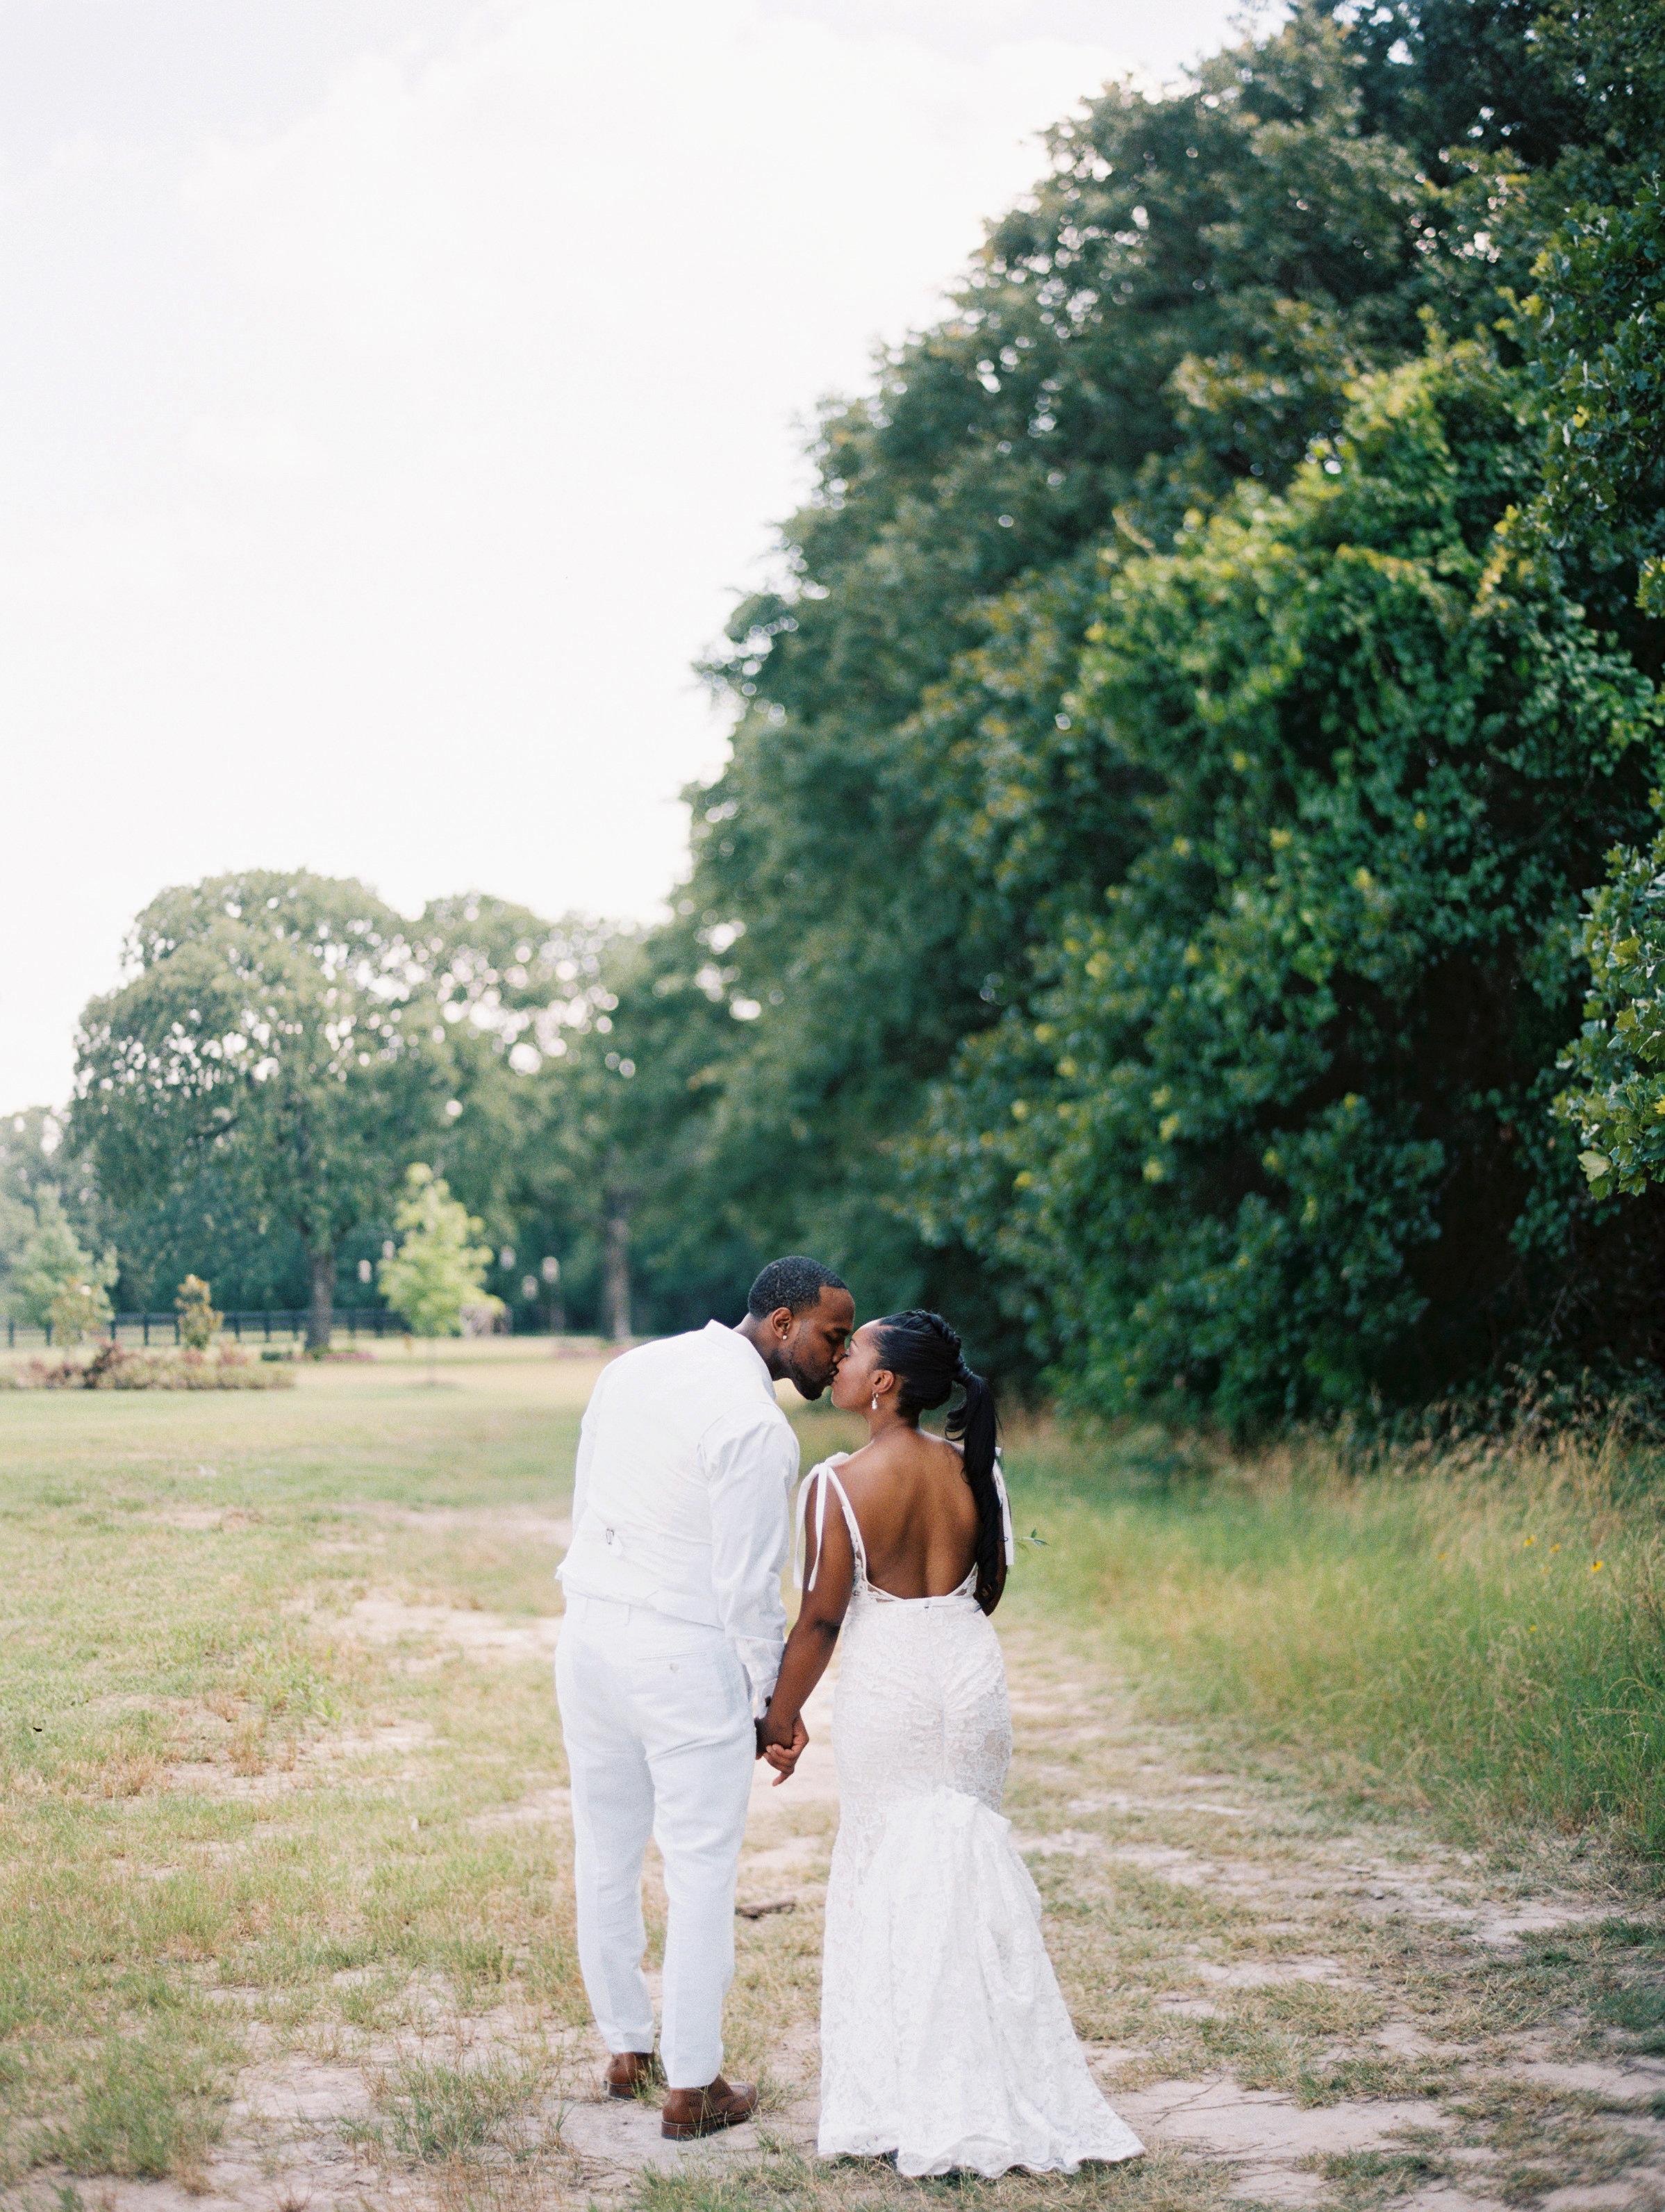 shakira travis wedding couple kiss